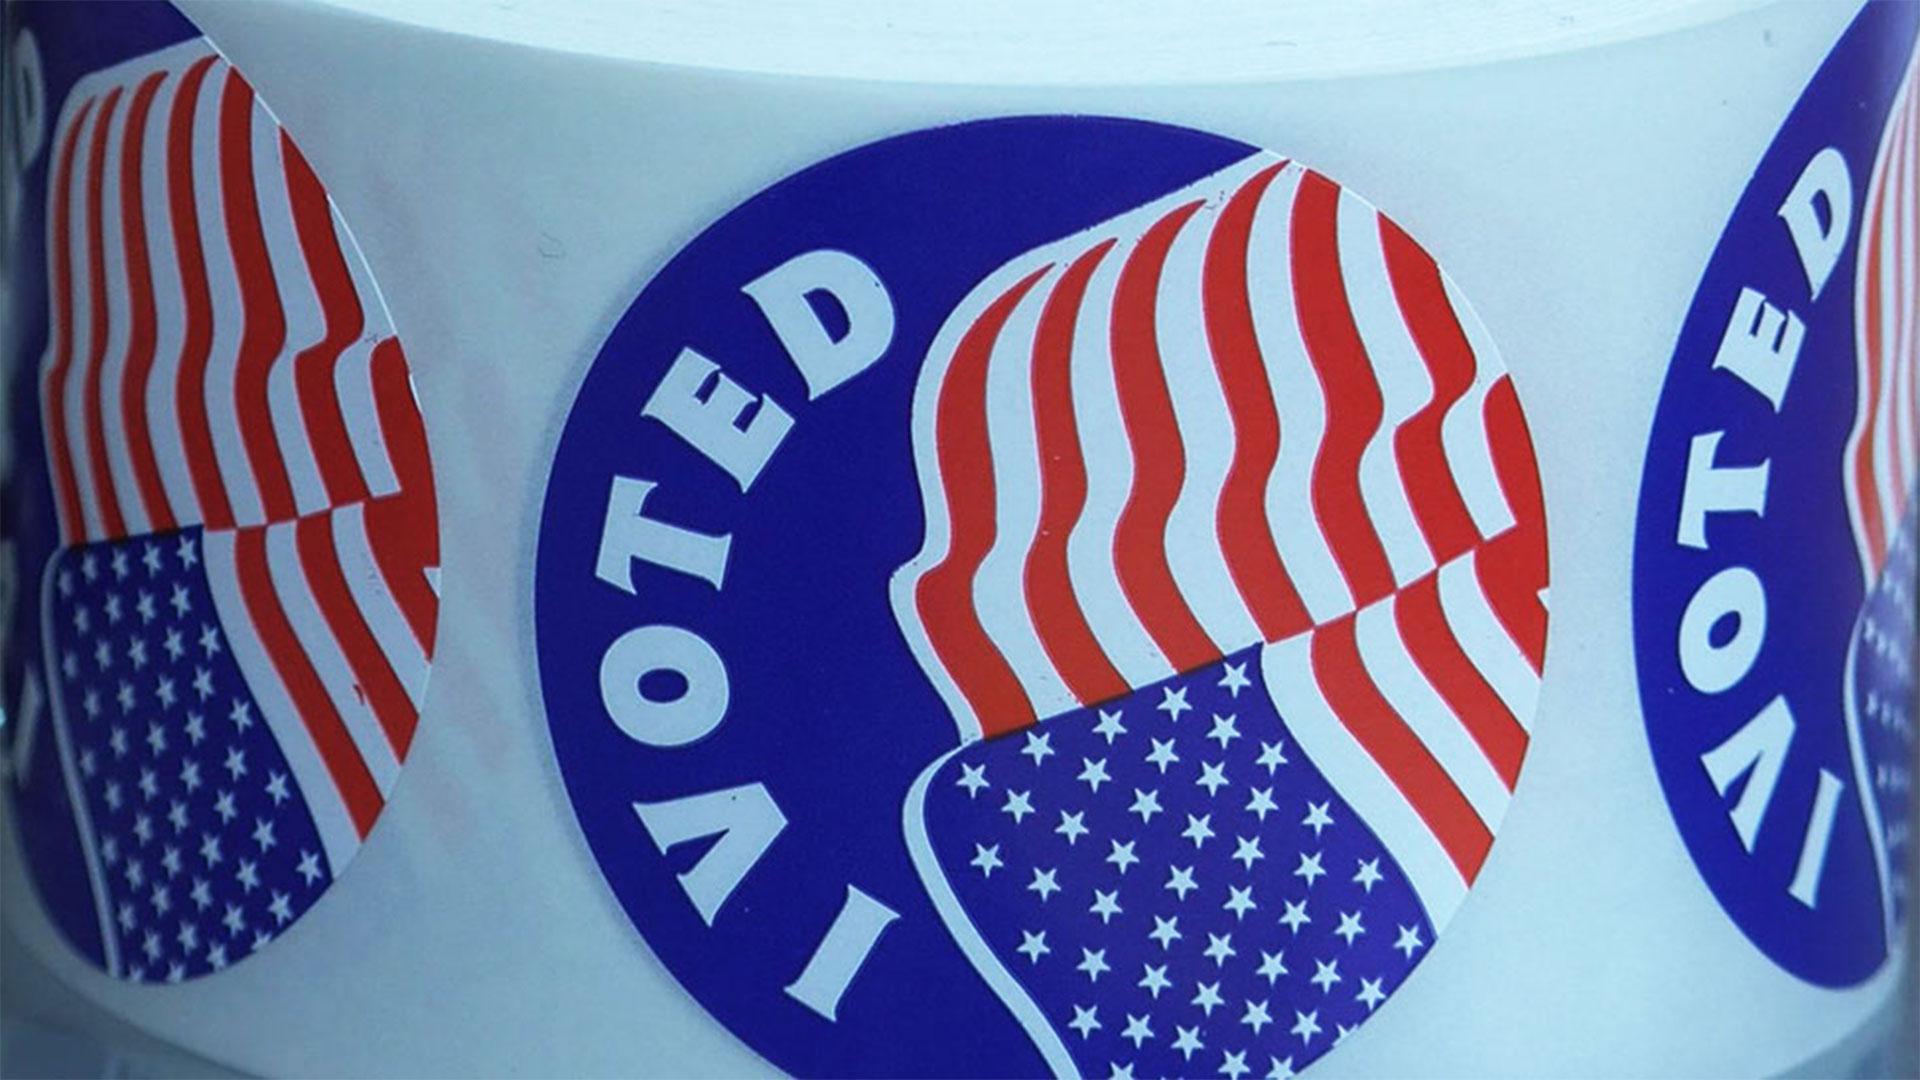 KELO voting stickers election vote